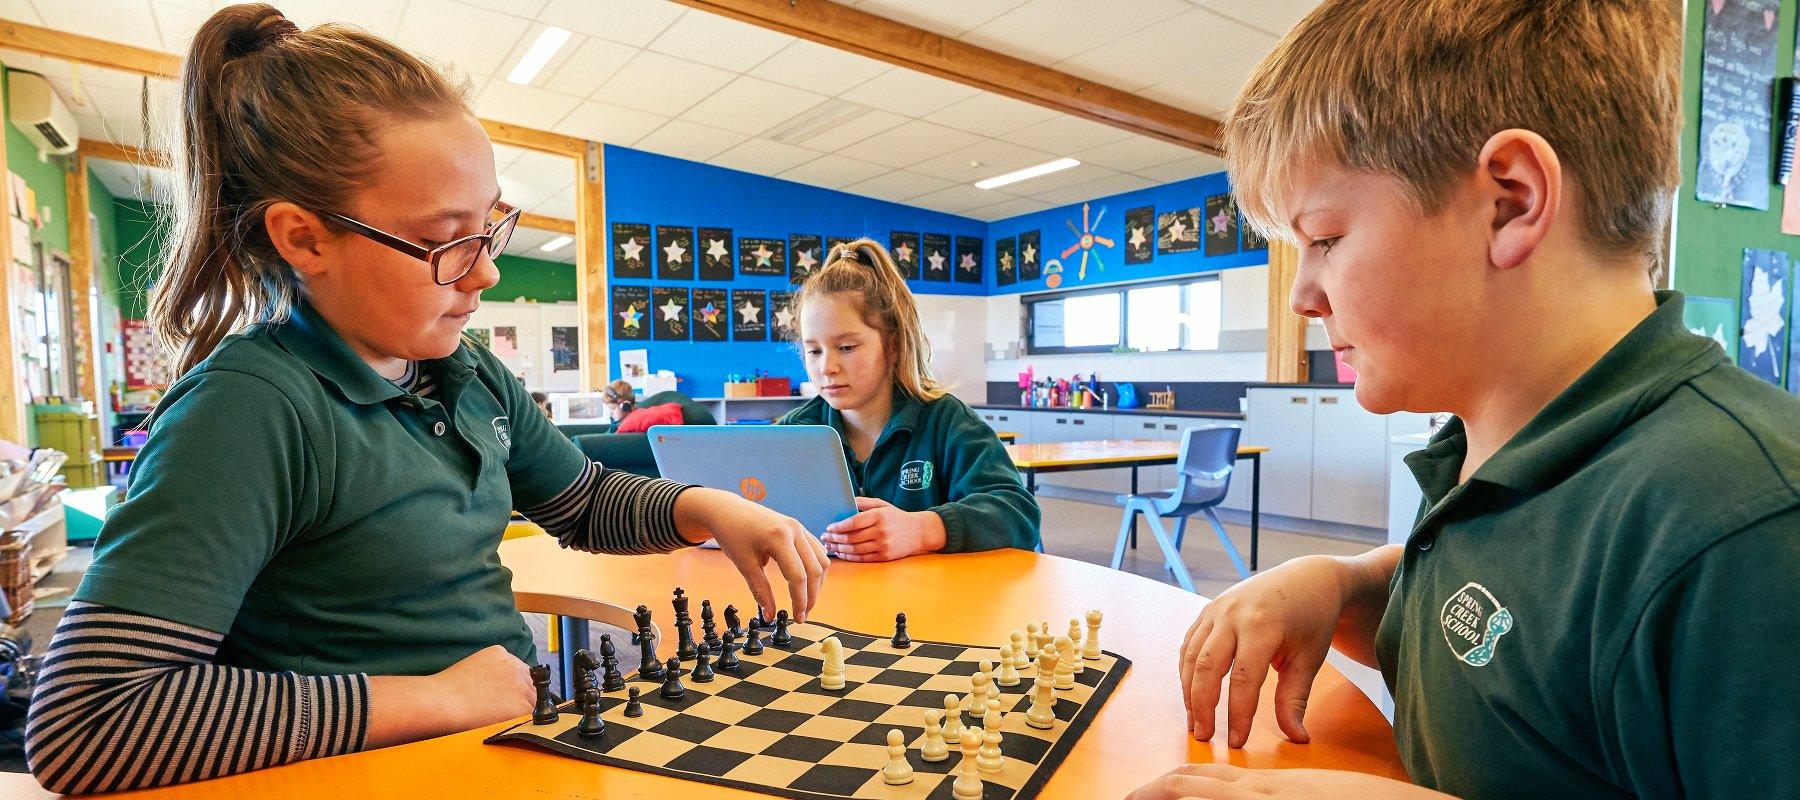 Playing chess Spring Creek School